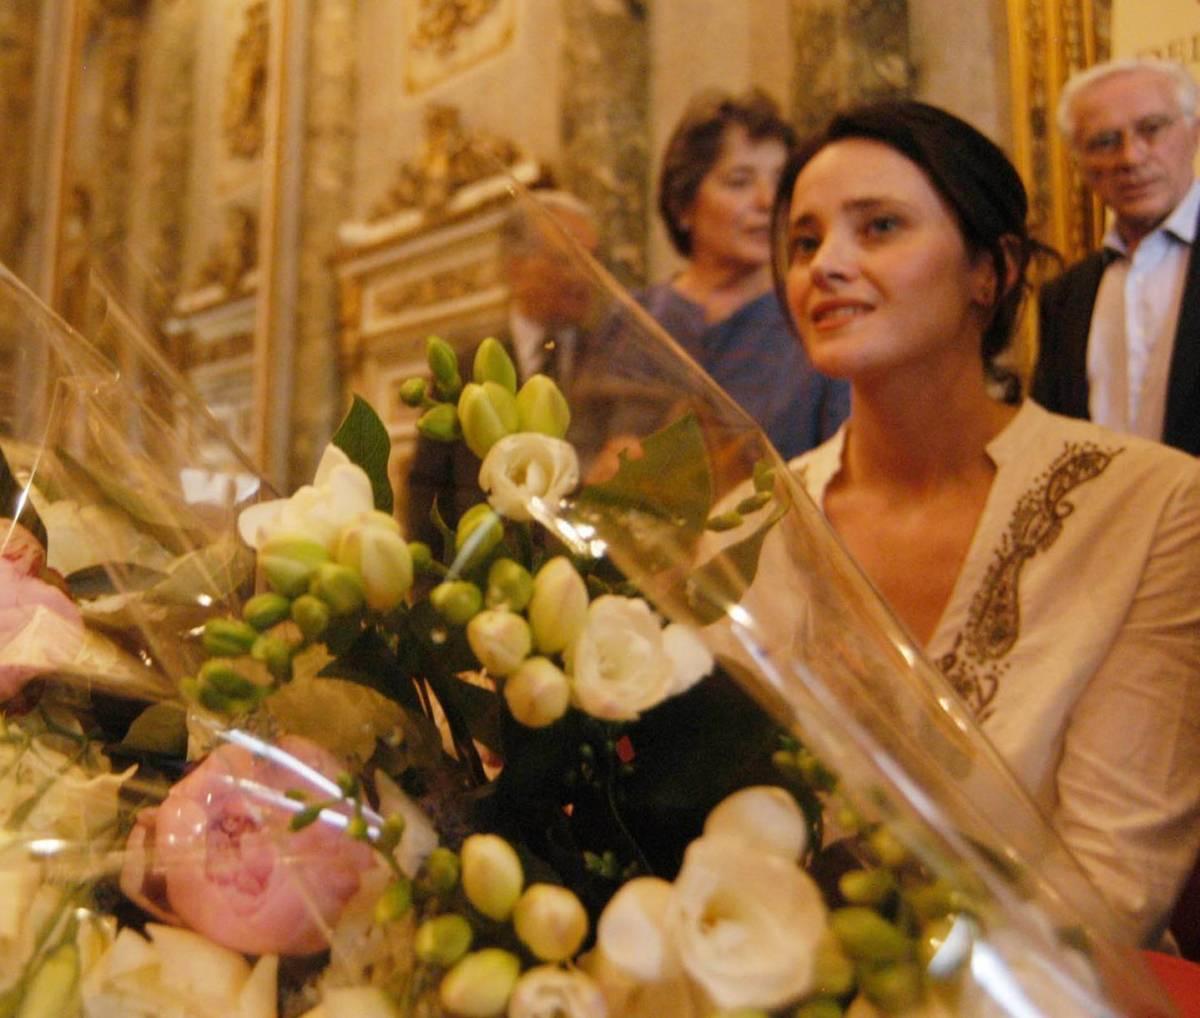 Fiori e striscioni in via Jan: «Bentornata Clementina»